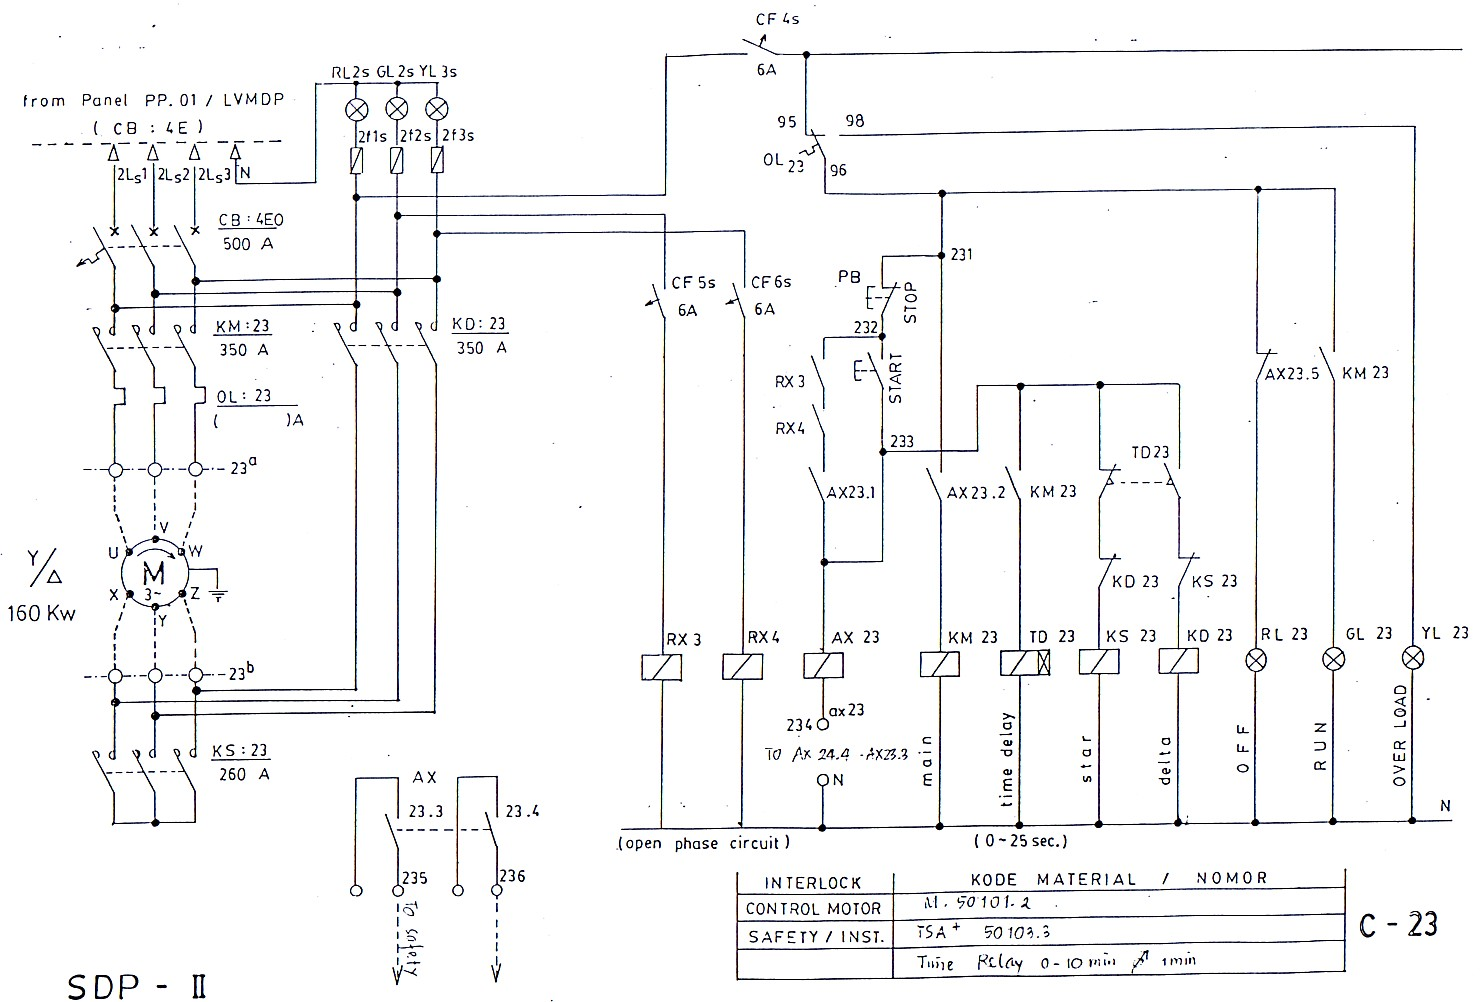 Diagram Software Wiring Diagram Listrik Full Version Hd Quality Diagram Listrik Trackdiagrams Agorasup Fr